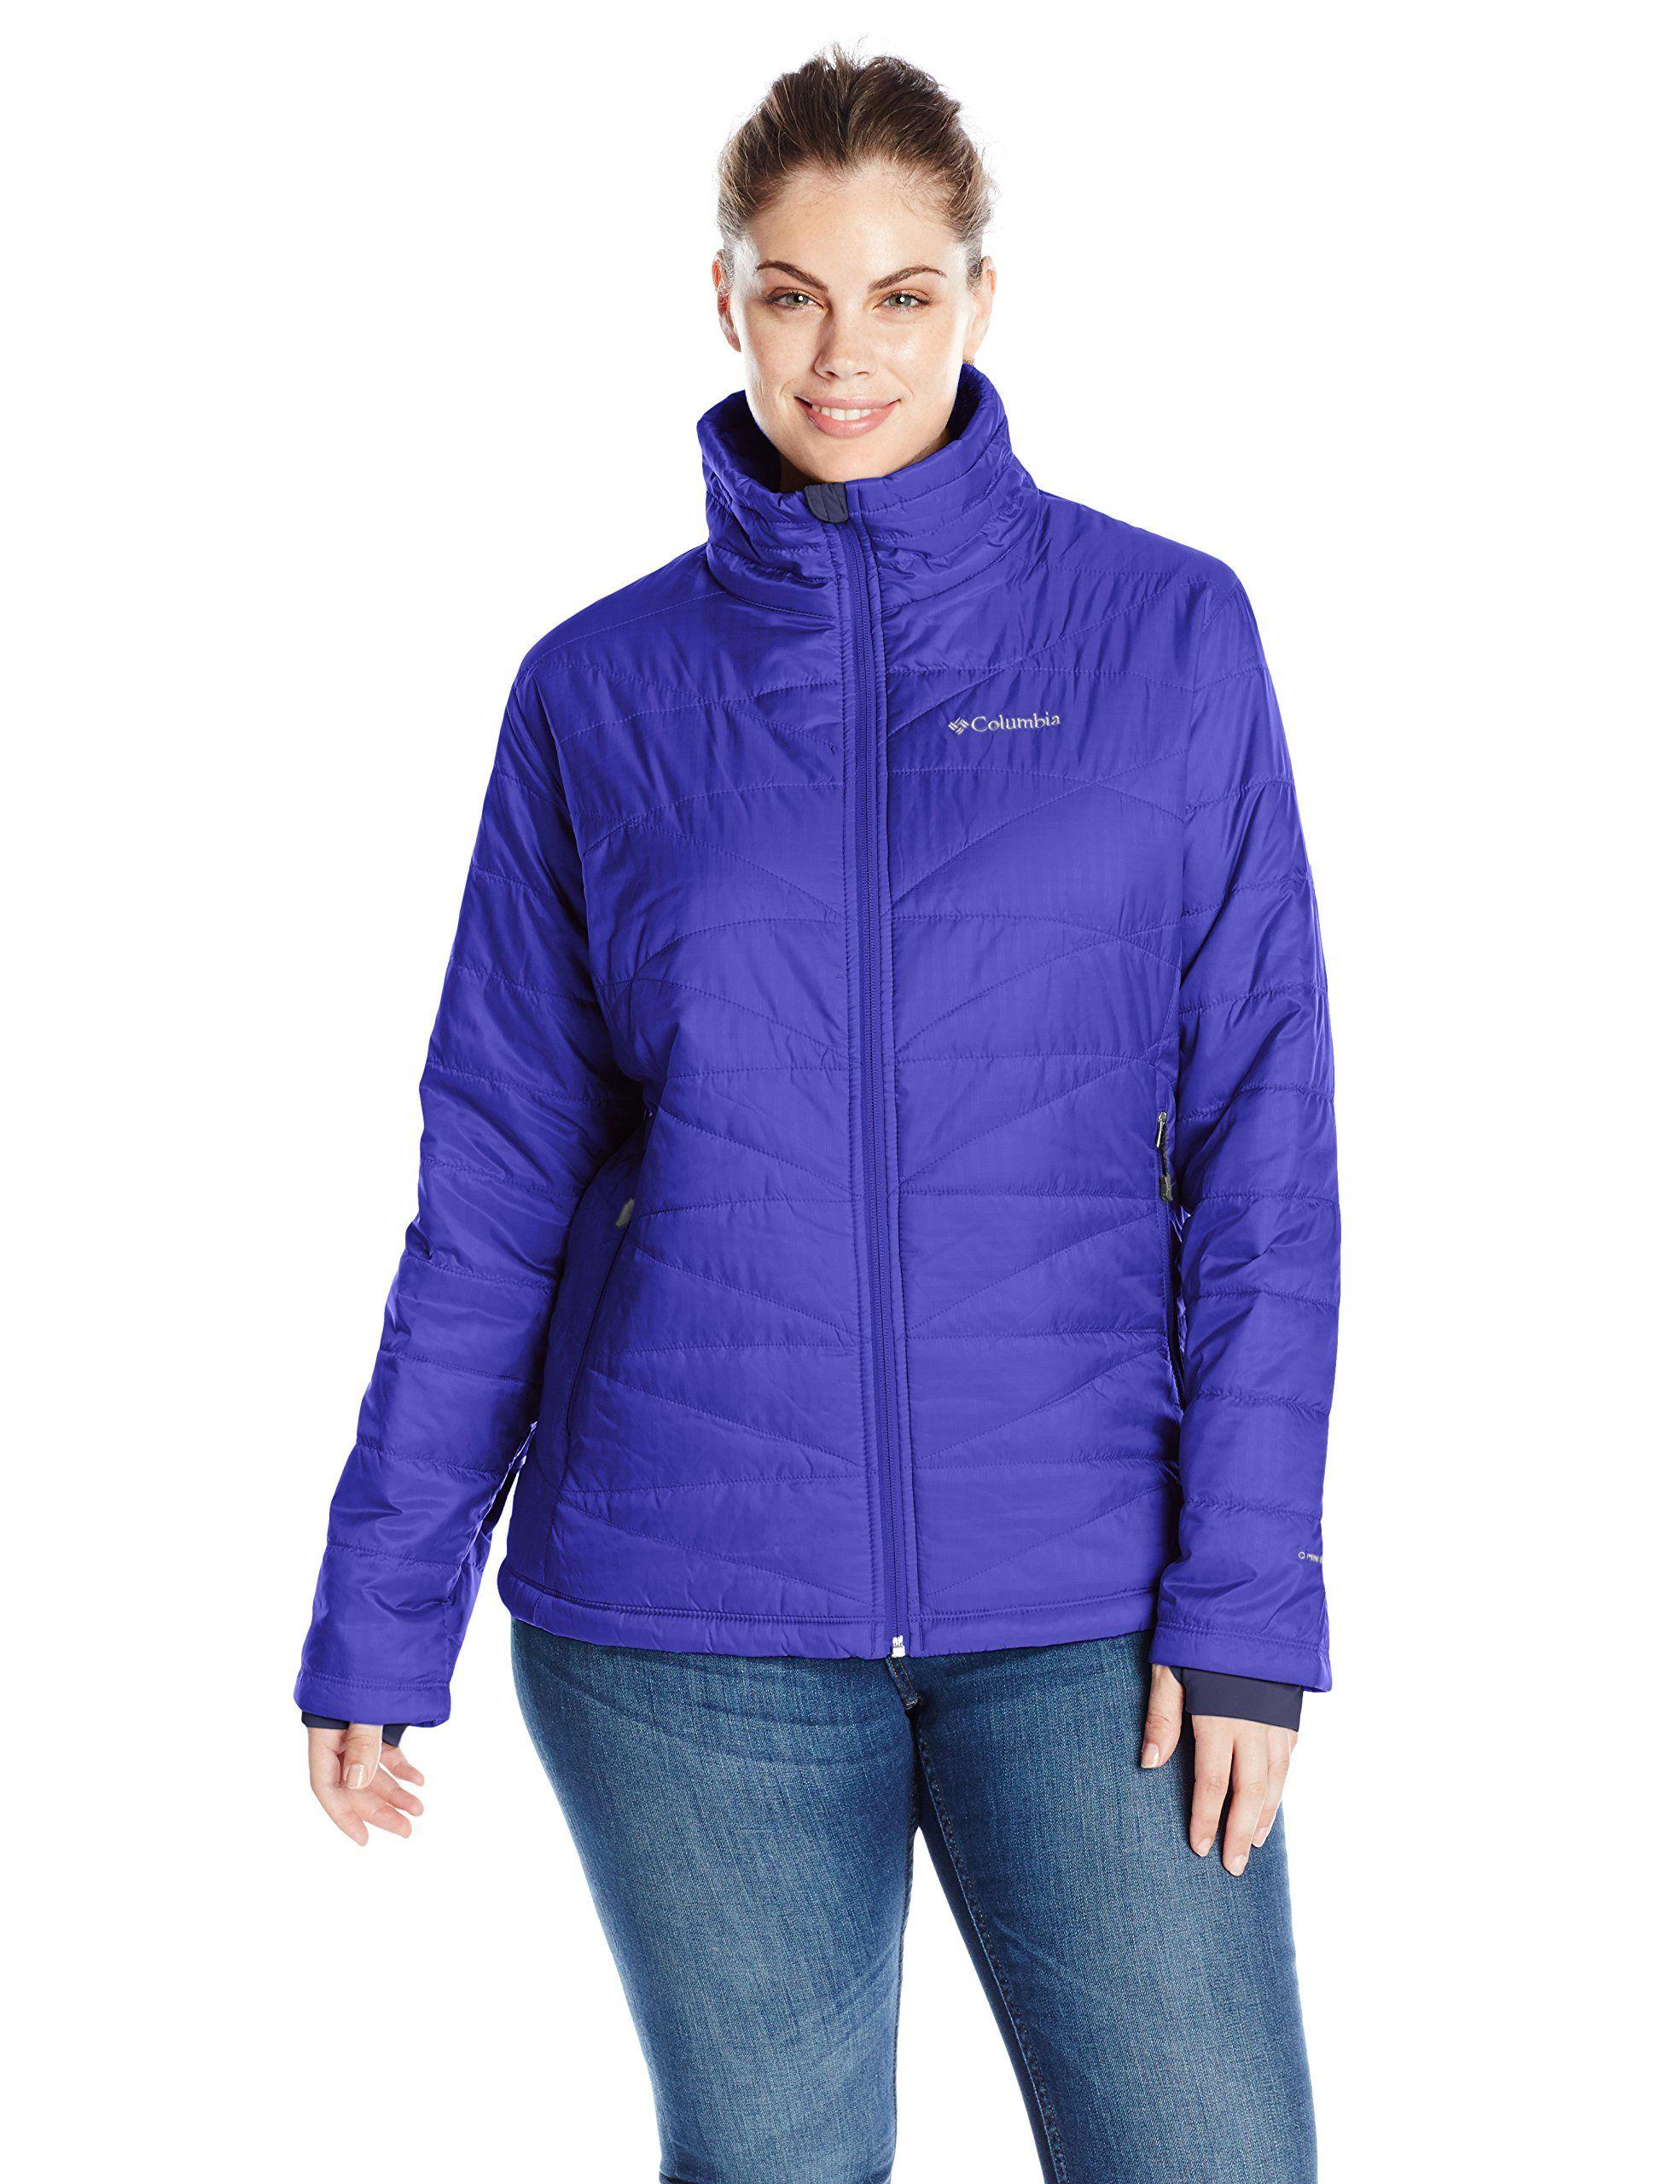 3bf9fd23093 Columbia Women s Plus Size Mighty Lite iii Jacket